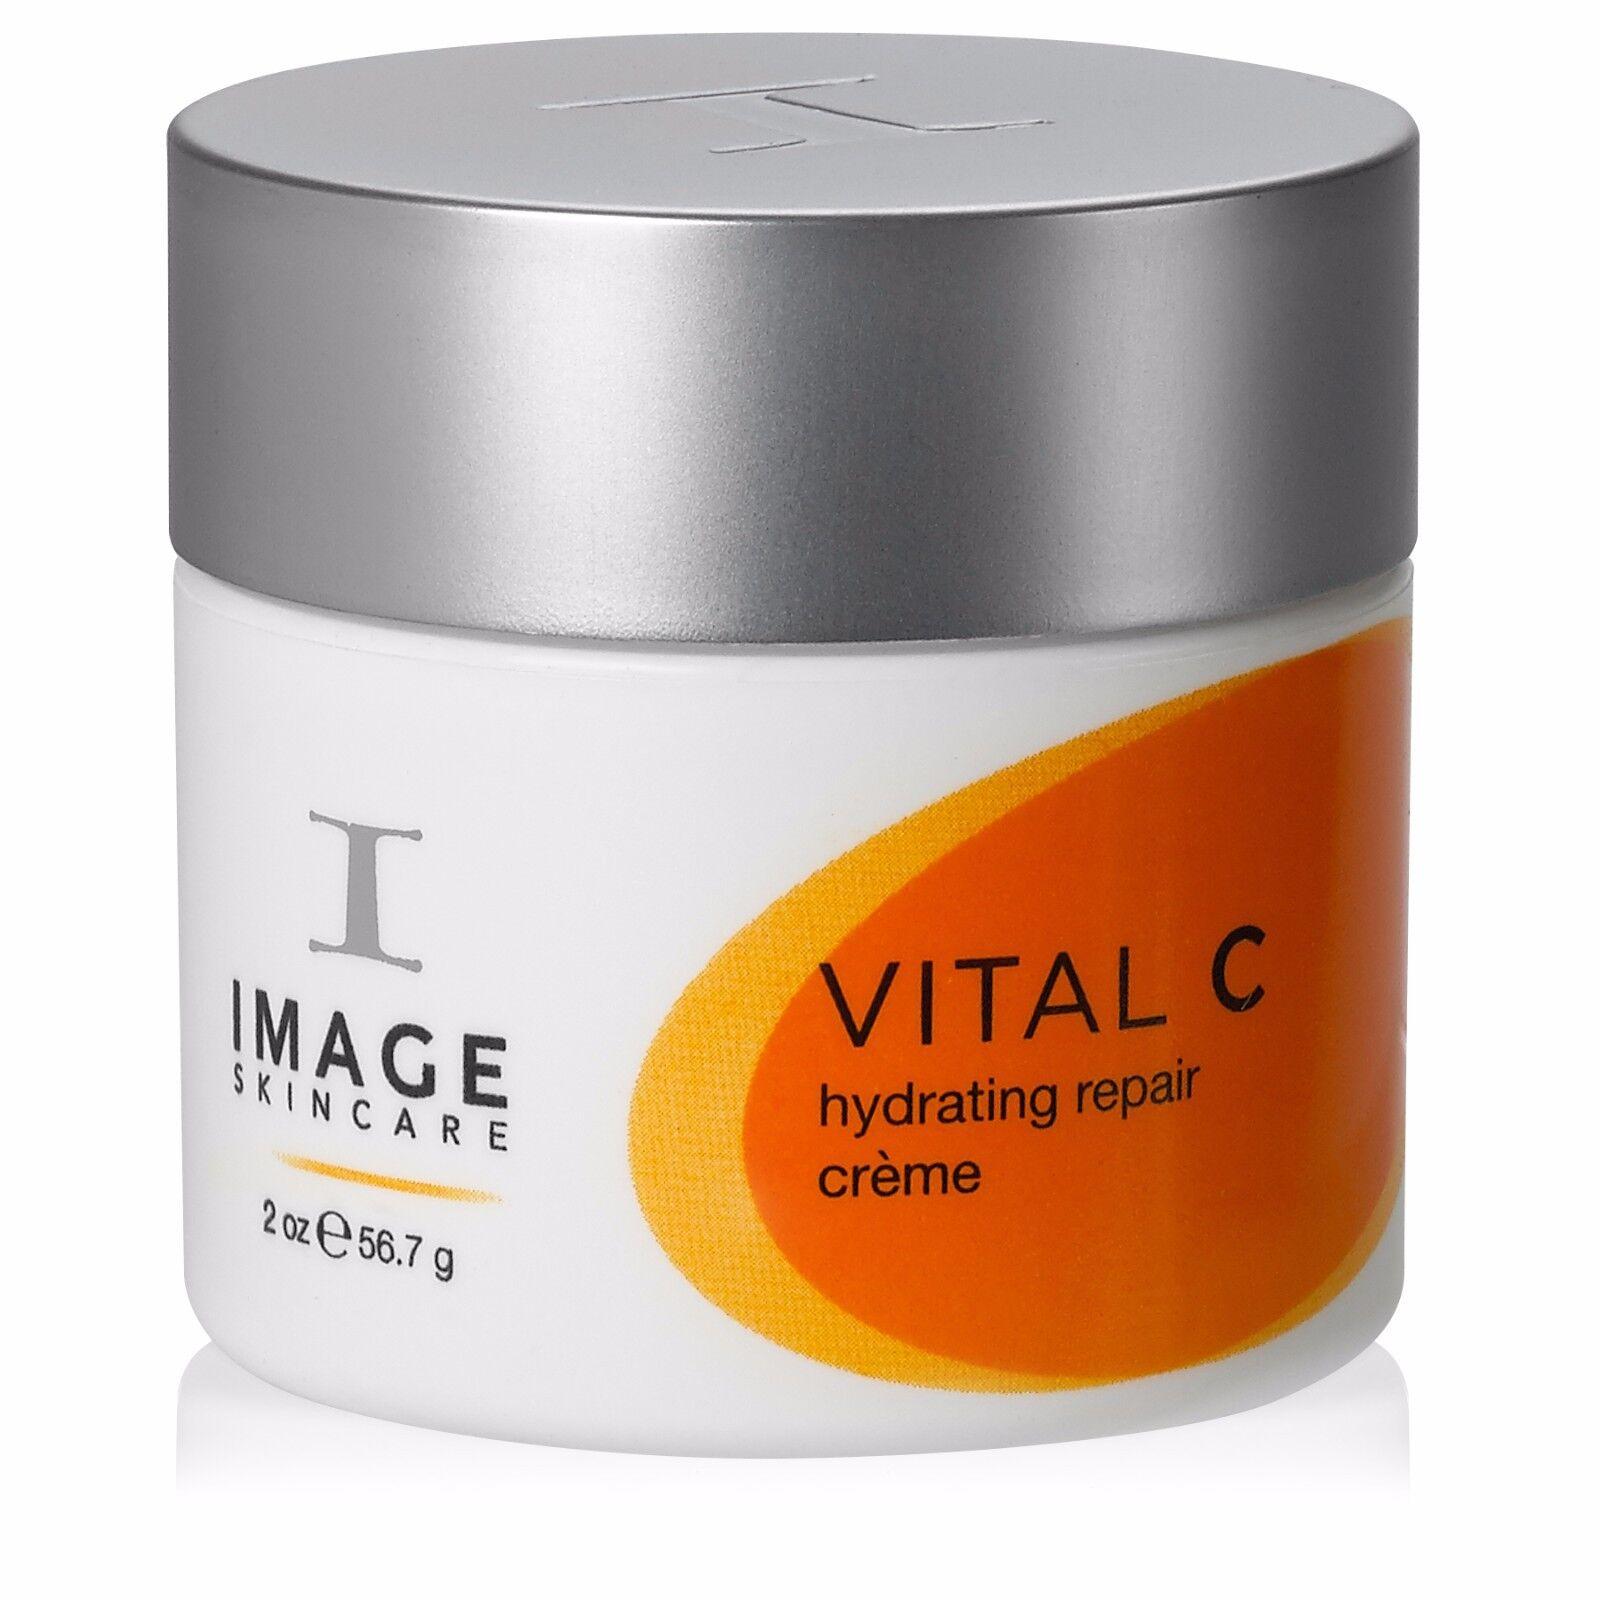 IMAGE Skincare Vital C Hydrating Repair Crème,  2 oz.